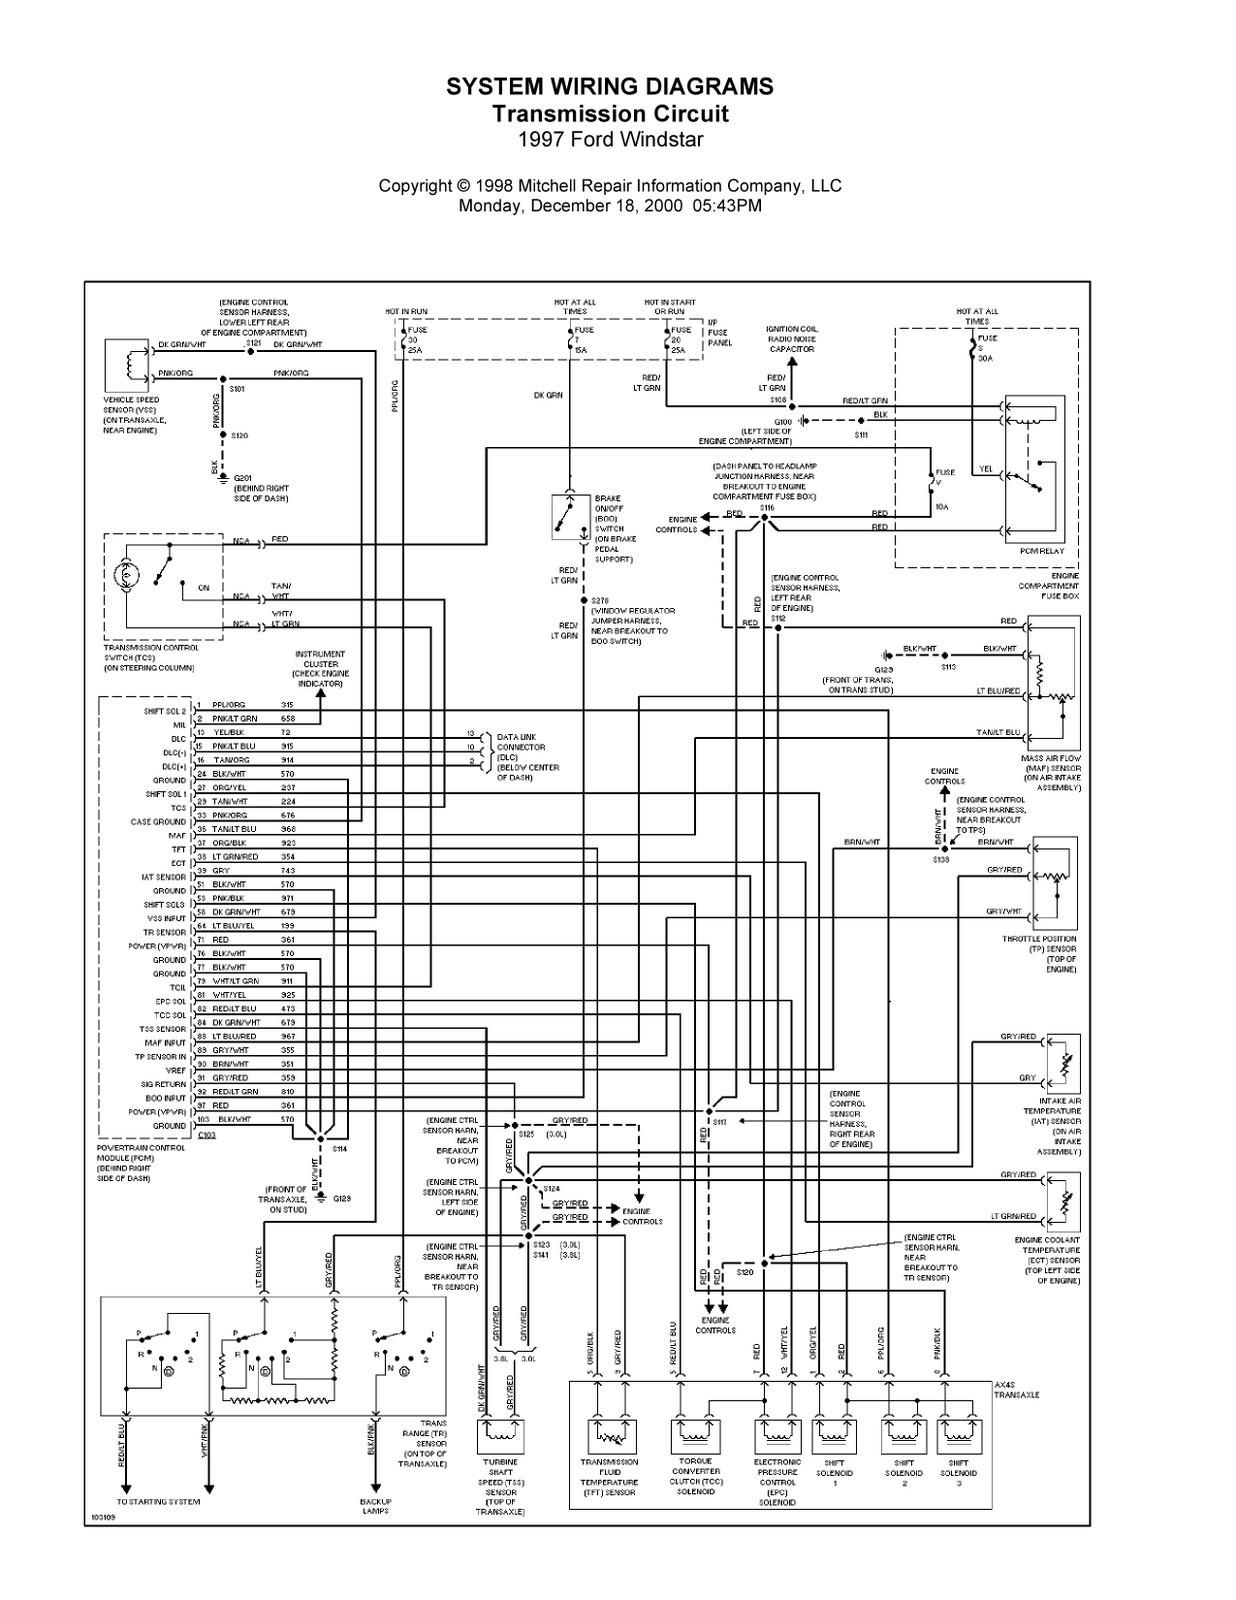 1998 ford Escort Zx2 Engine Diagram Best 1999 ford Escort Wiring Diagram Irelandnews Of 1998 ford Escort Zx2 Engine Diagram